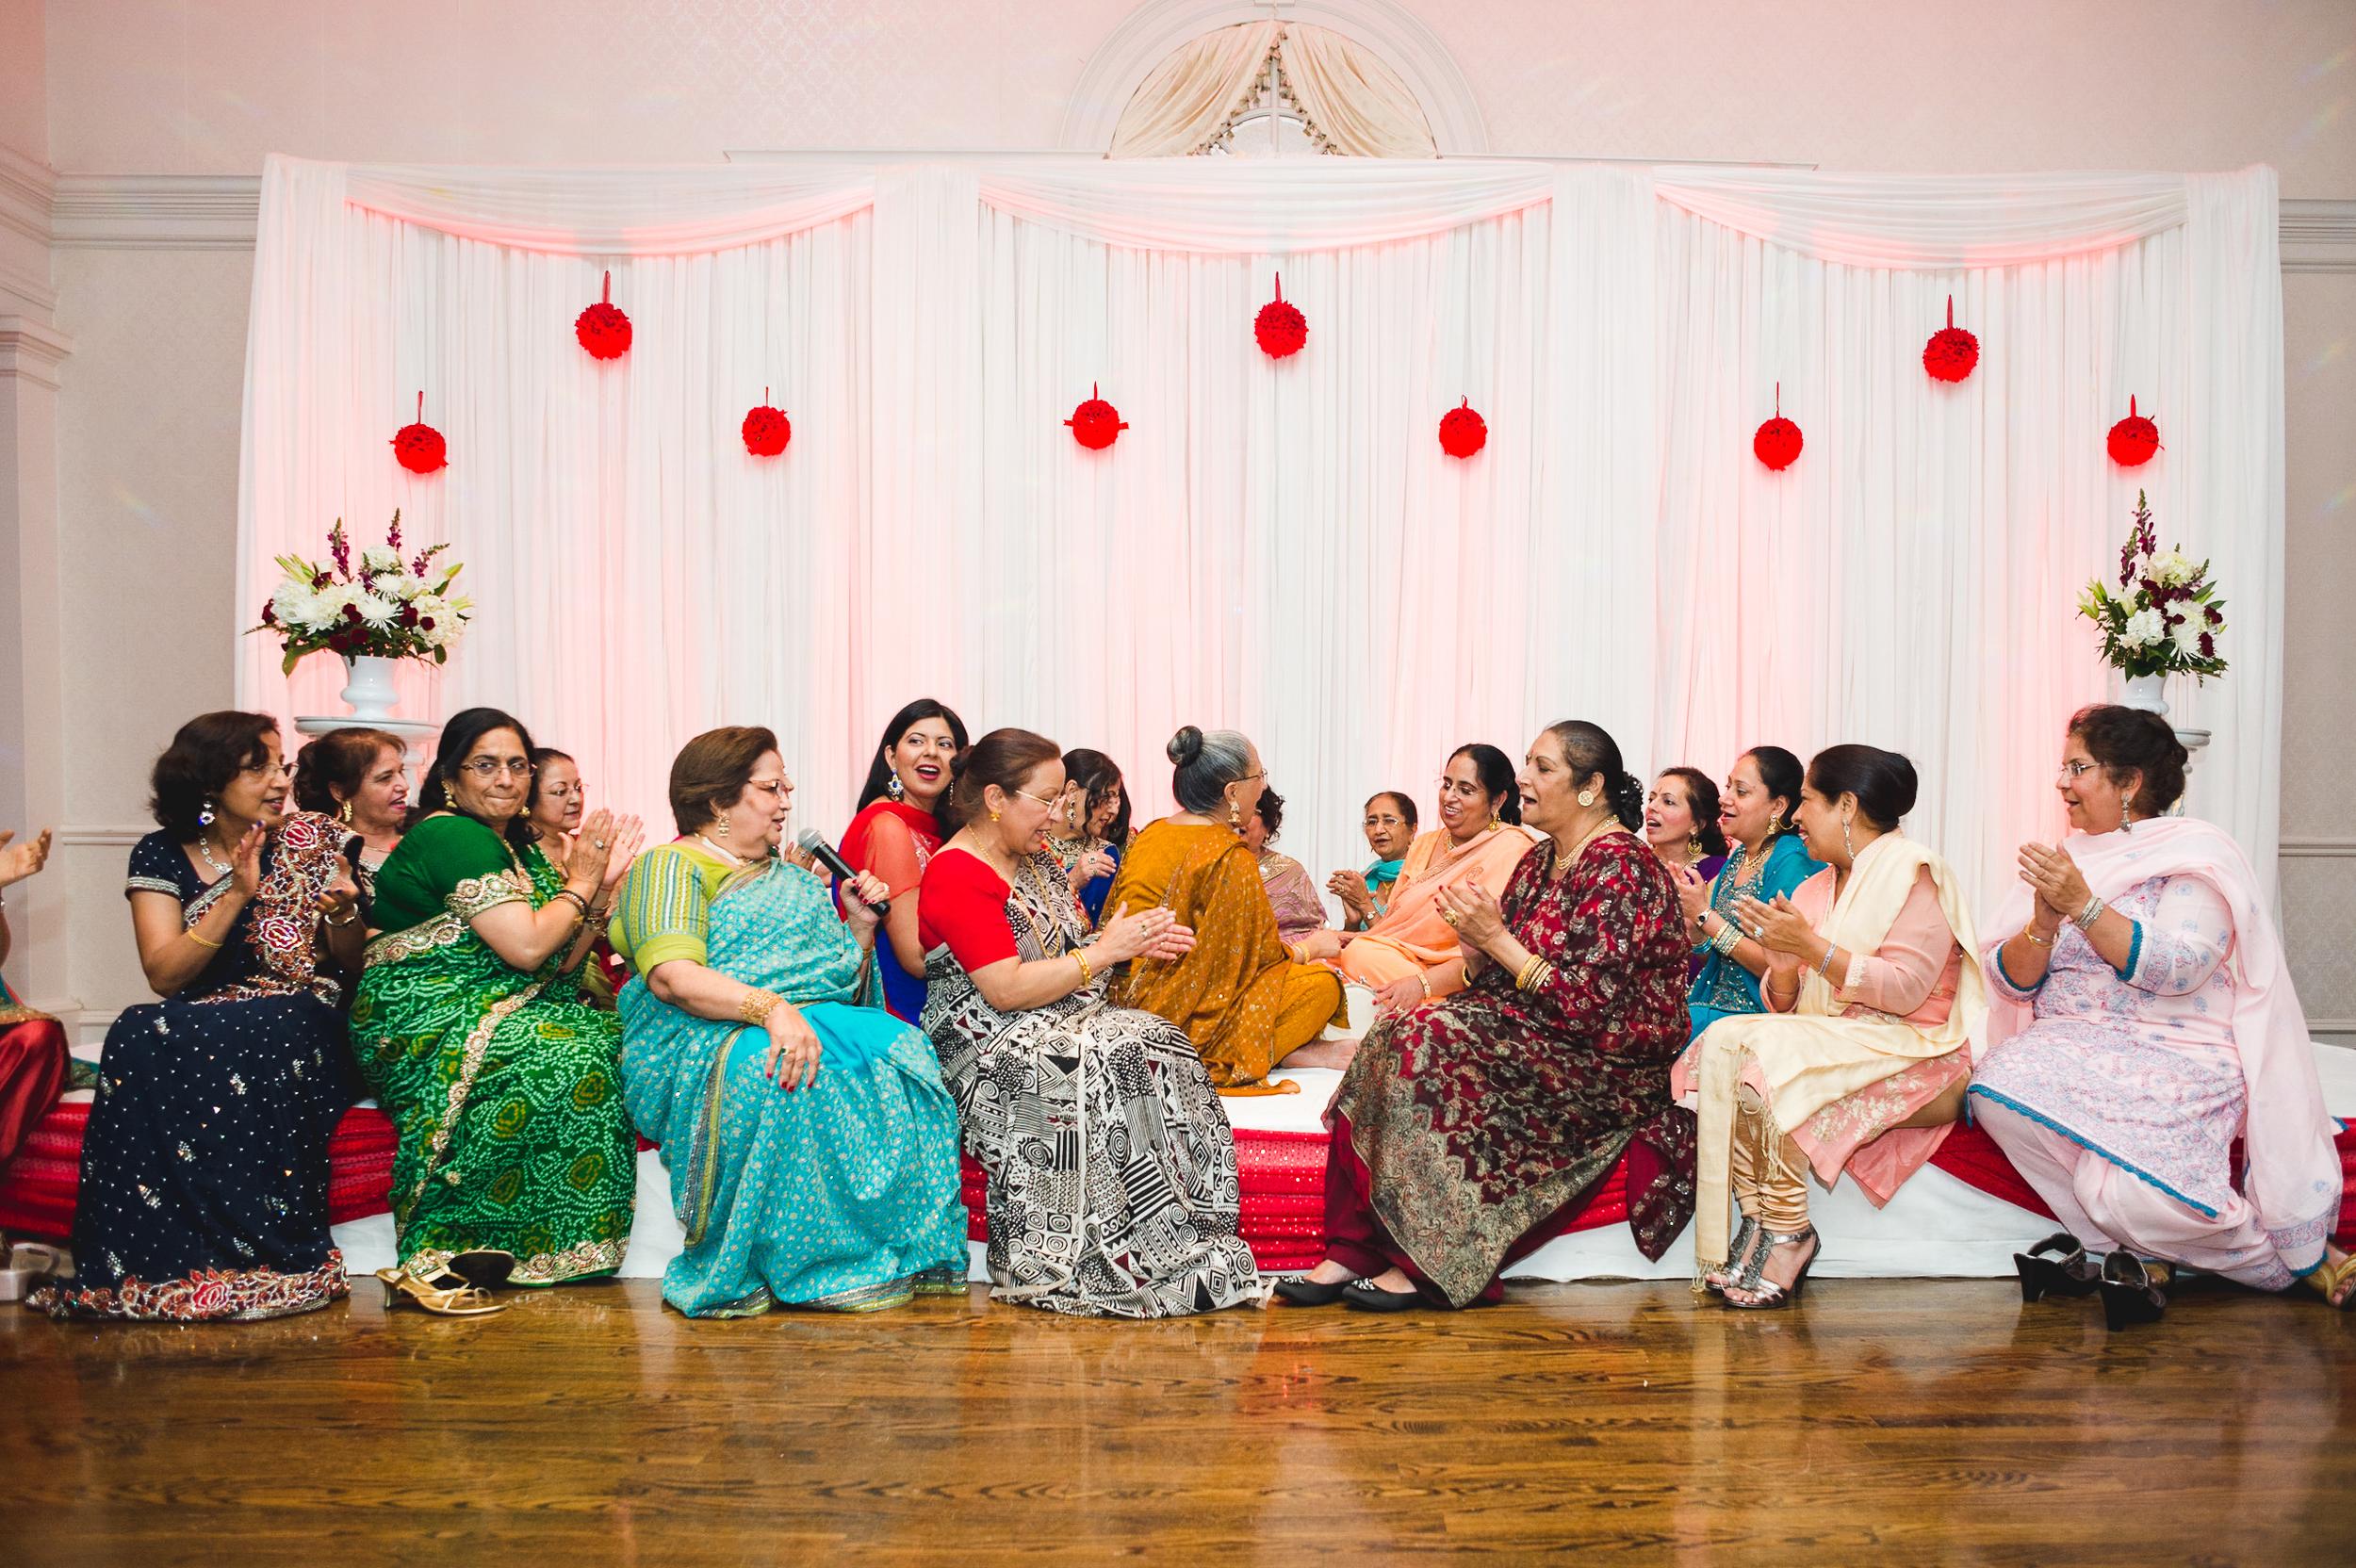 Indian wedding photographer washington dc Mantas Kubilinskas-13.jpg